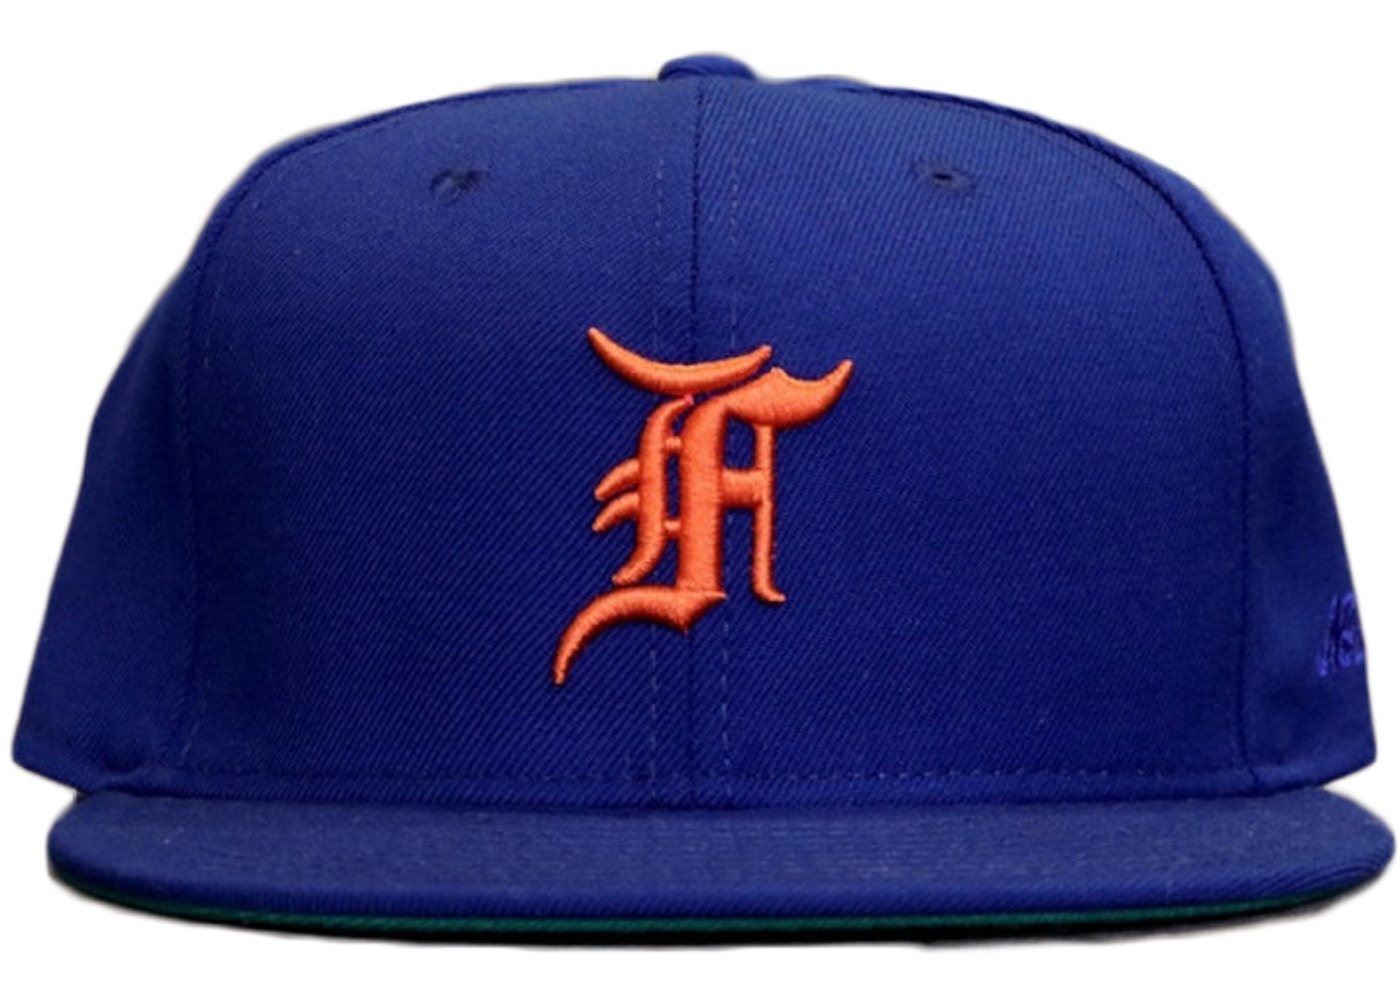 FEAR OF GOD All Star New Era Fitted Cap Hat Blue Orange - Fifth ... 2aa9270c83d